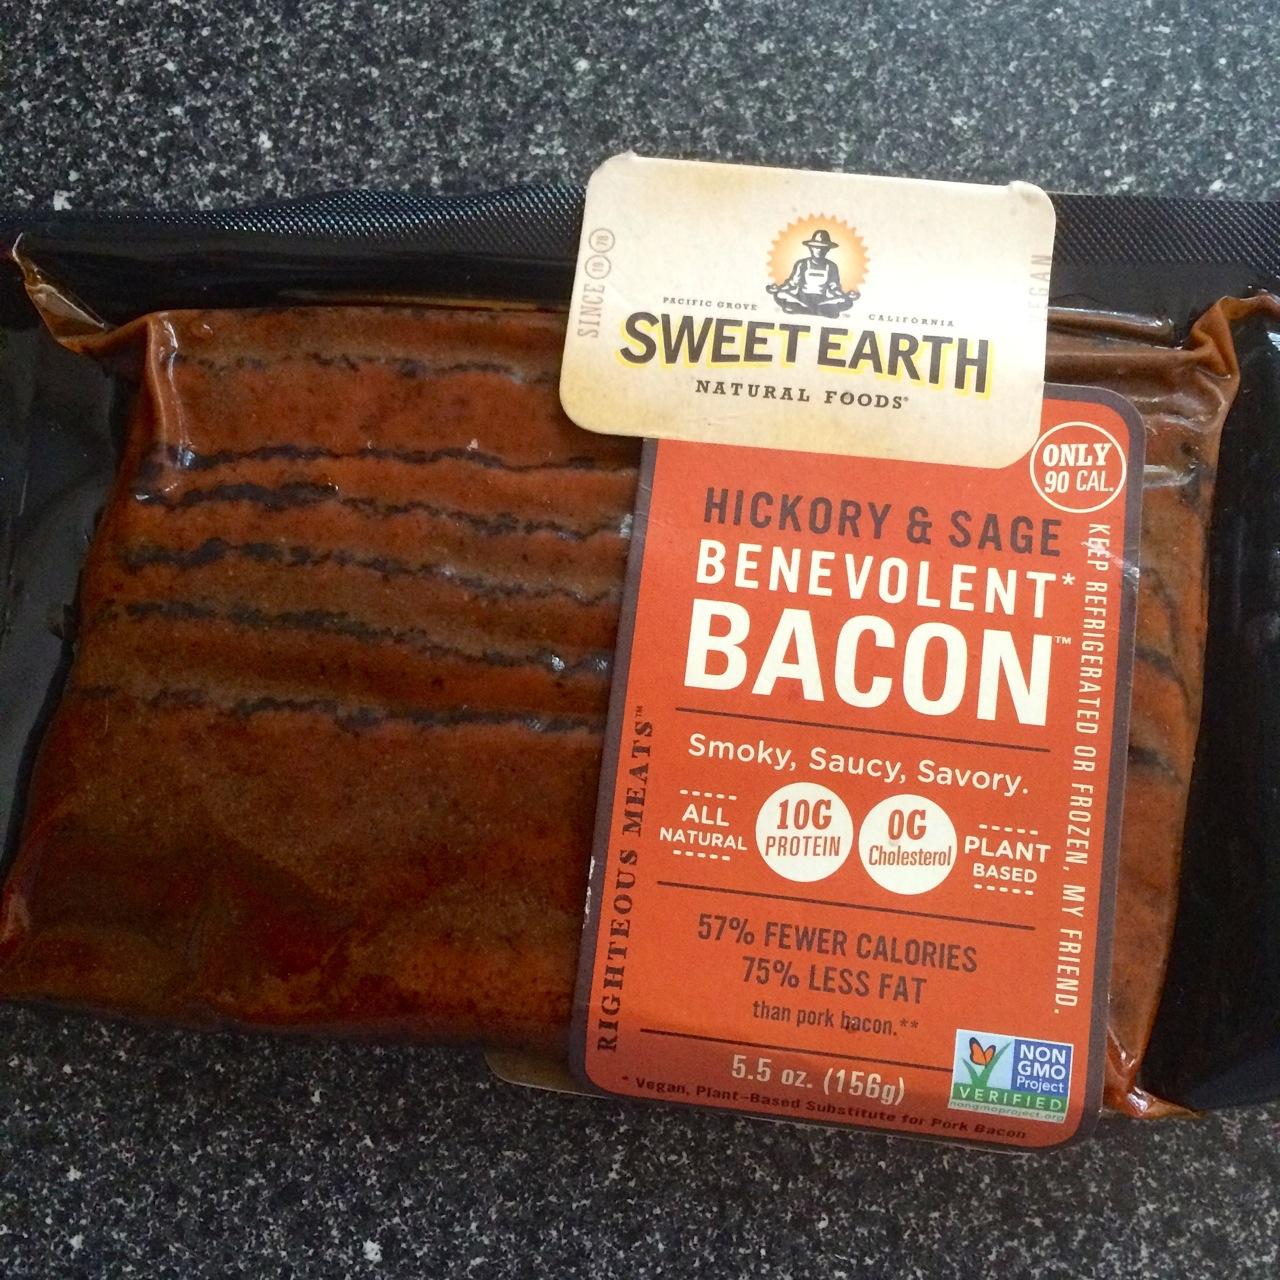 https://i2.wp.com/fatgayvegan.com/wp-content/uploads/2015/06/sweet-earth-seitan-bacon.jpg?fit=1280%2C1280